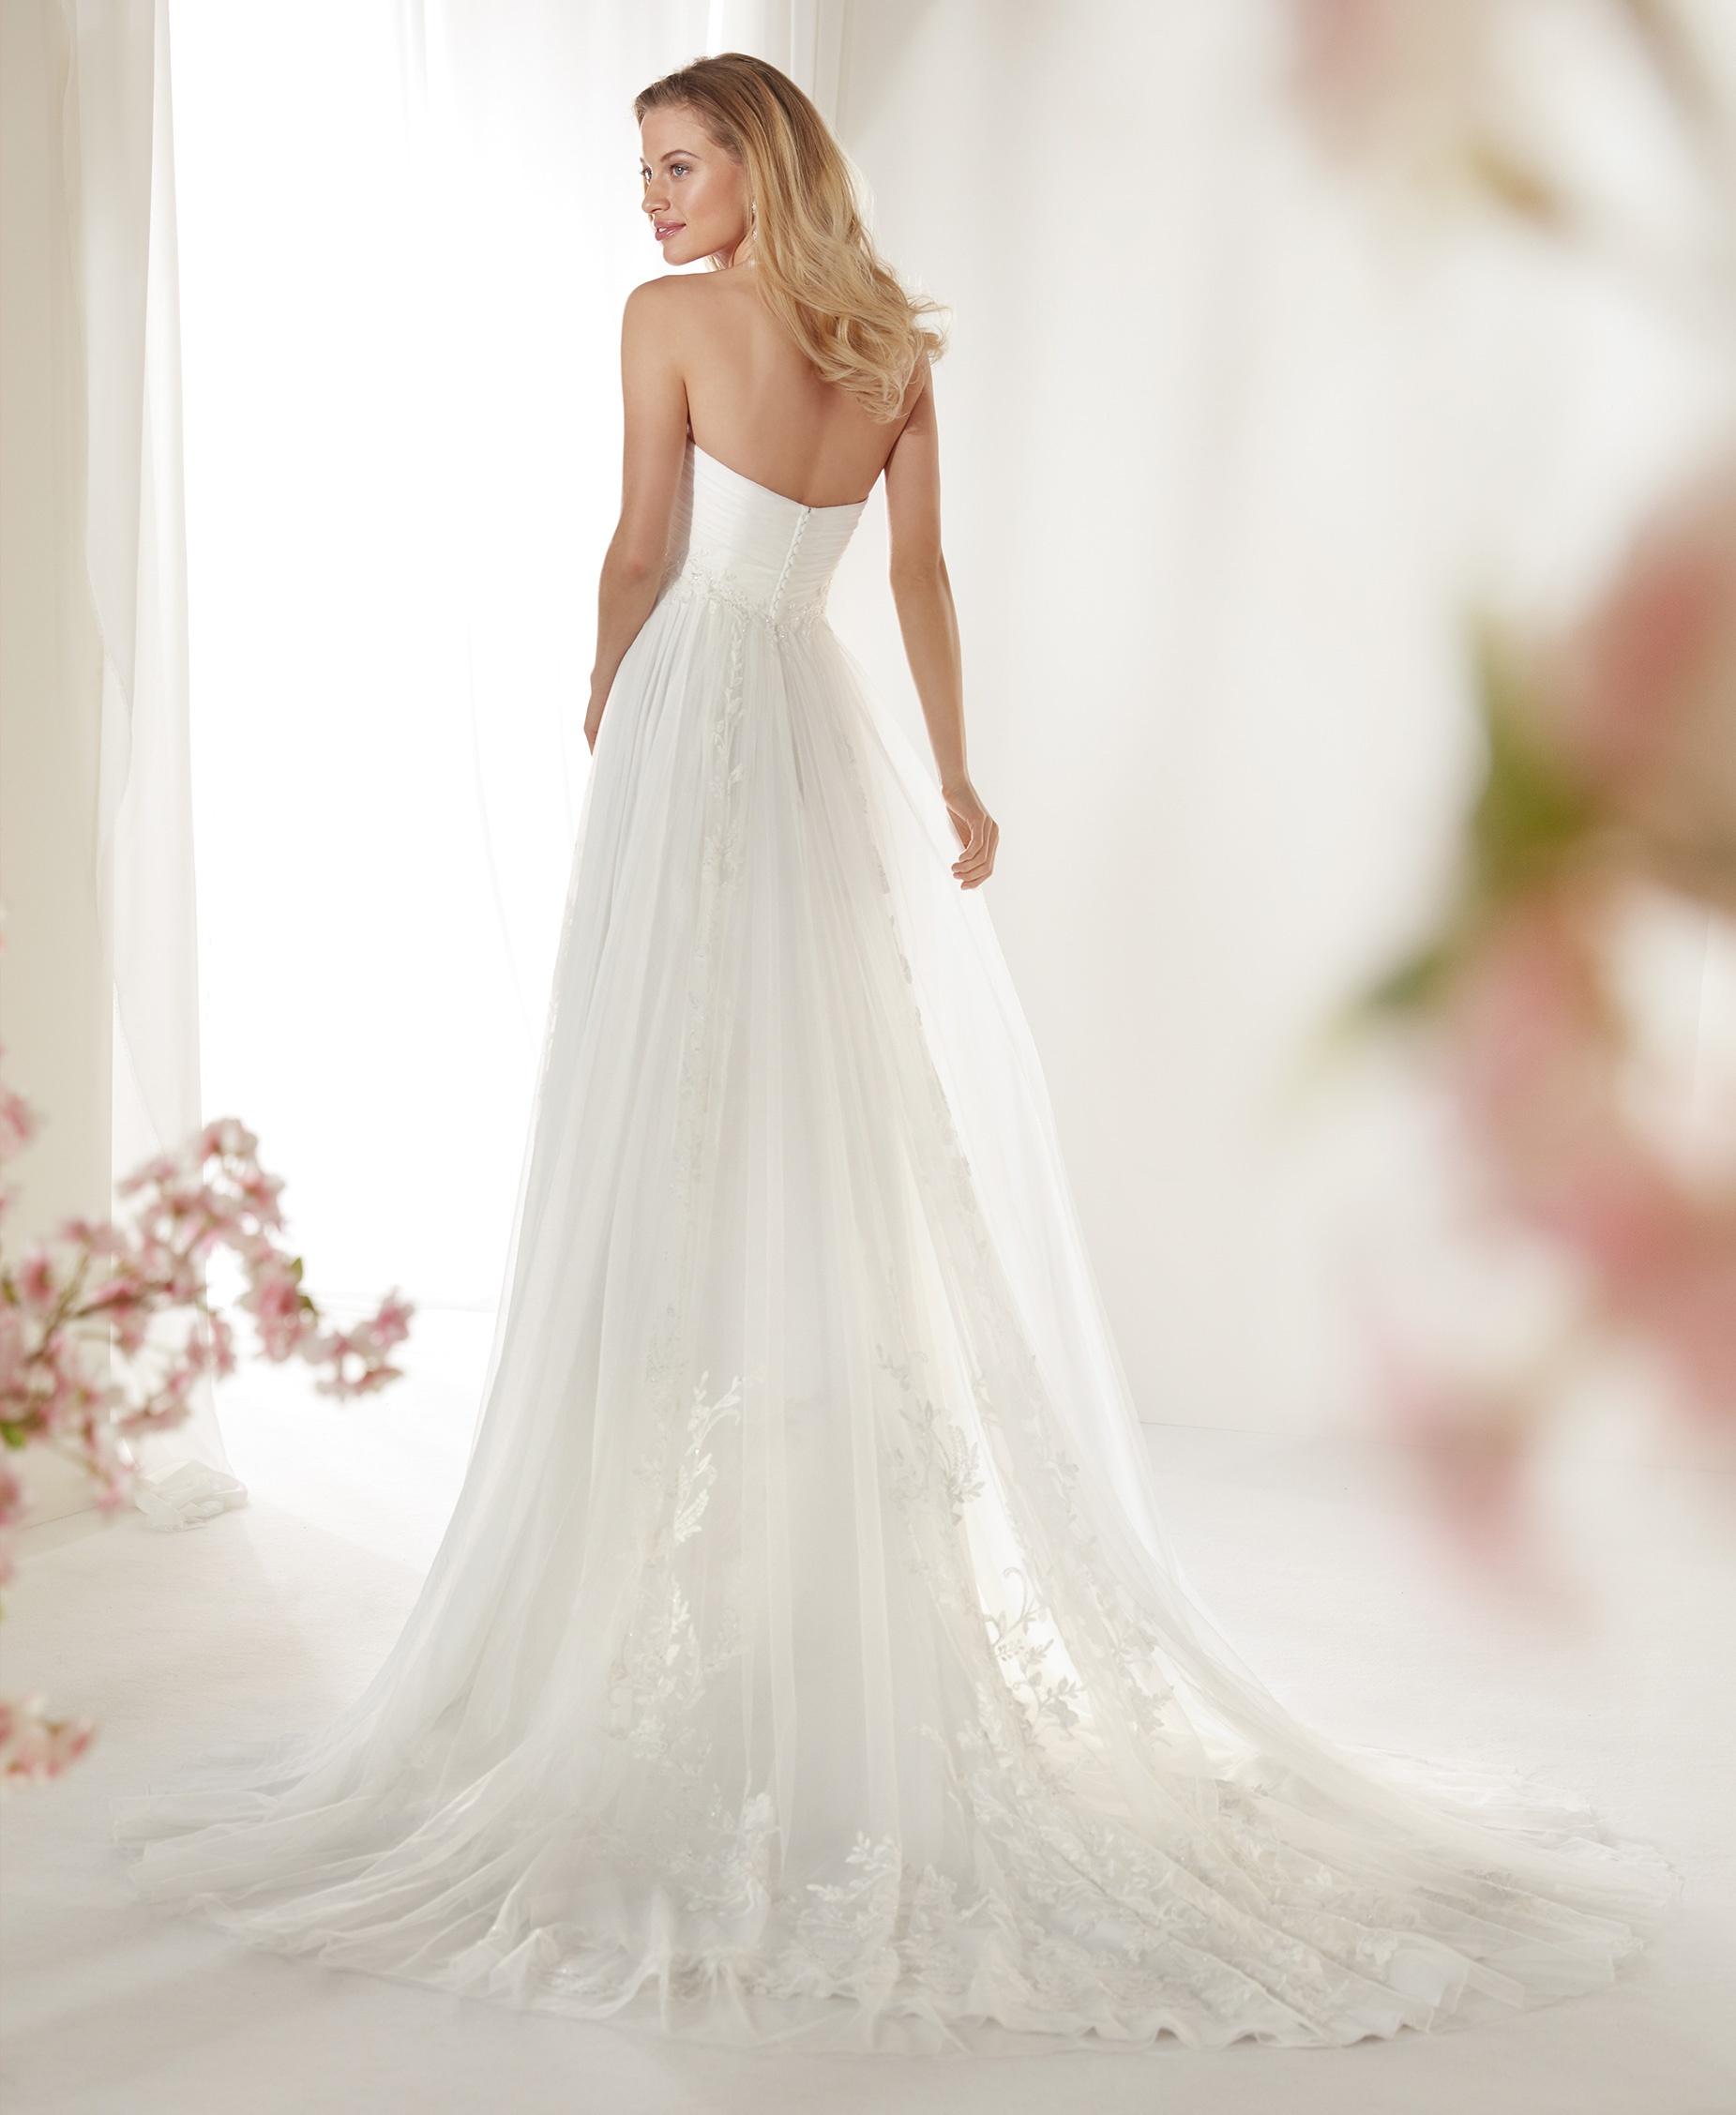 COAB19220 esküvői ruha - NICOLE SPOSE Milano kollekció